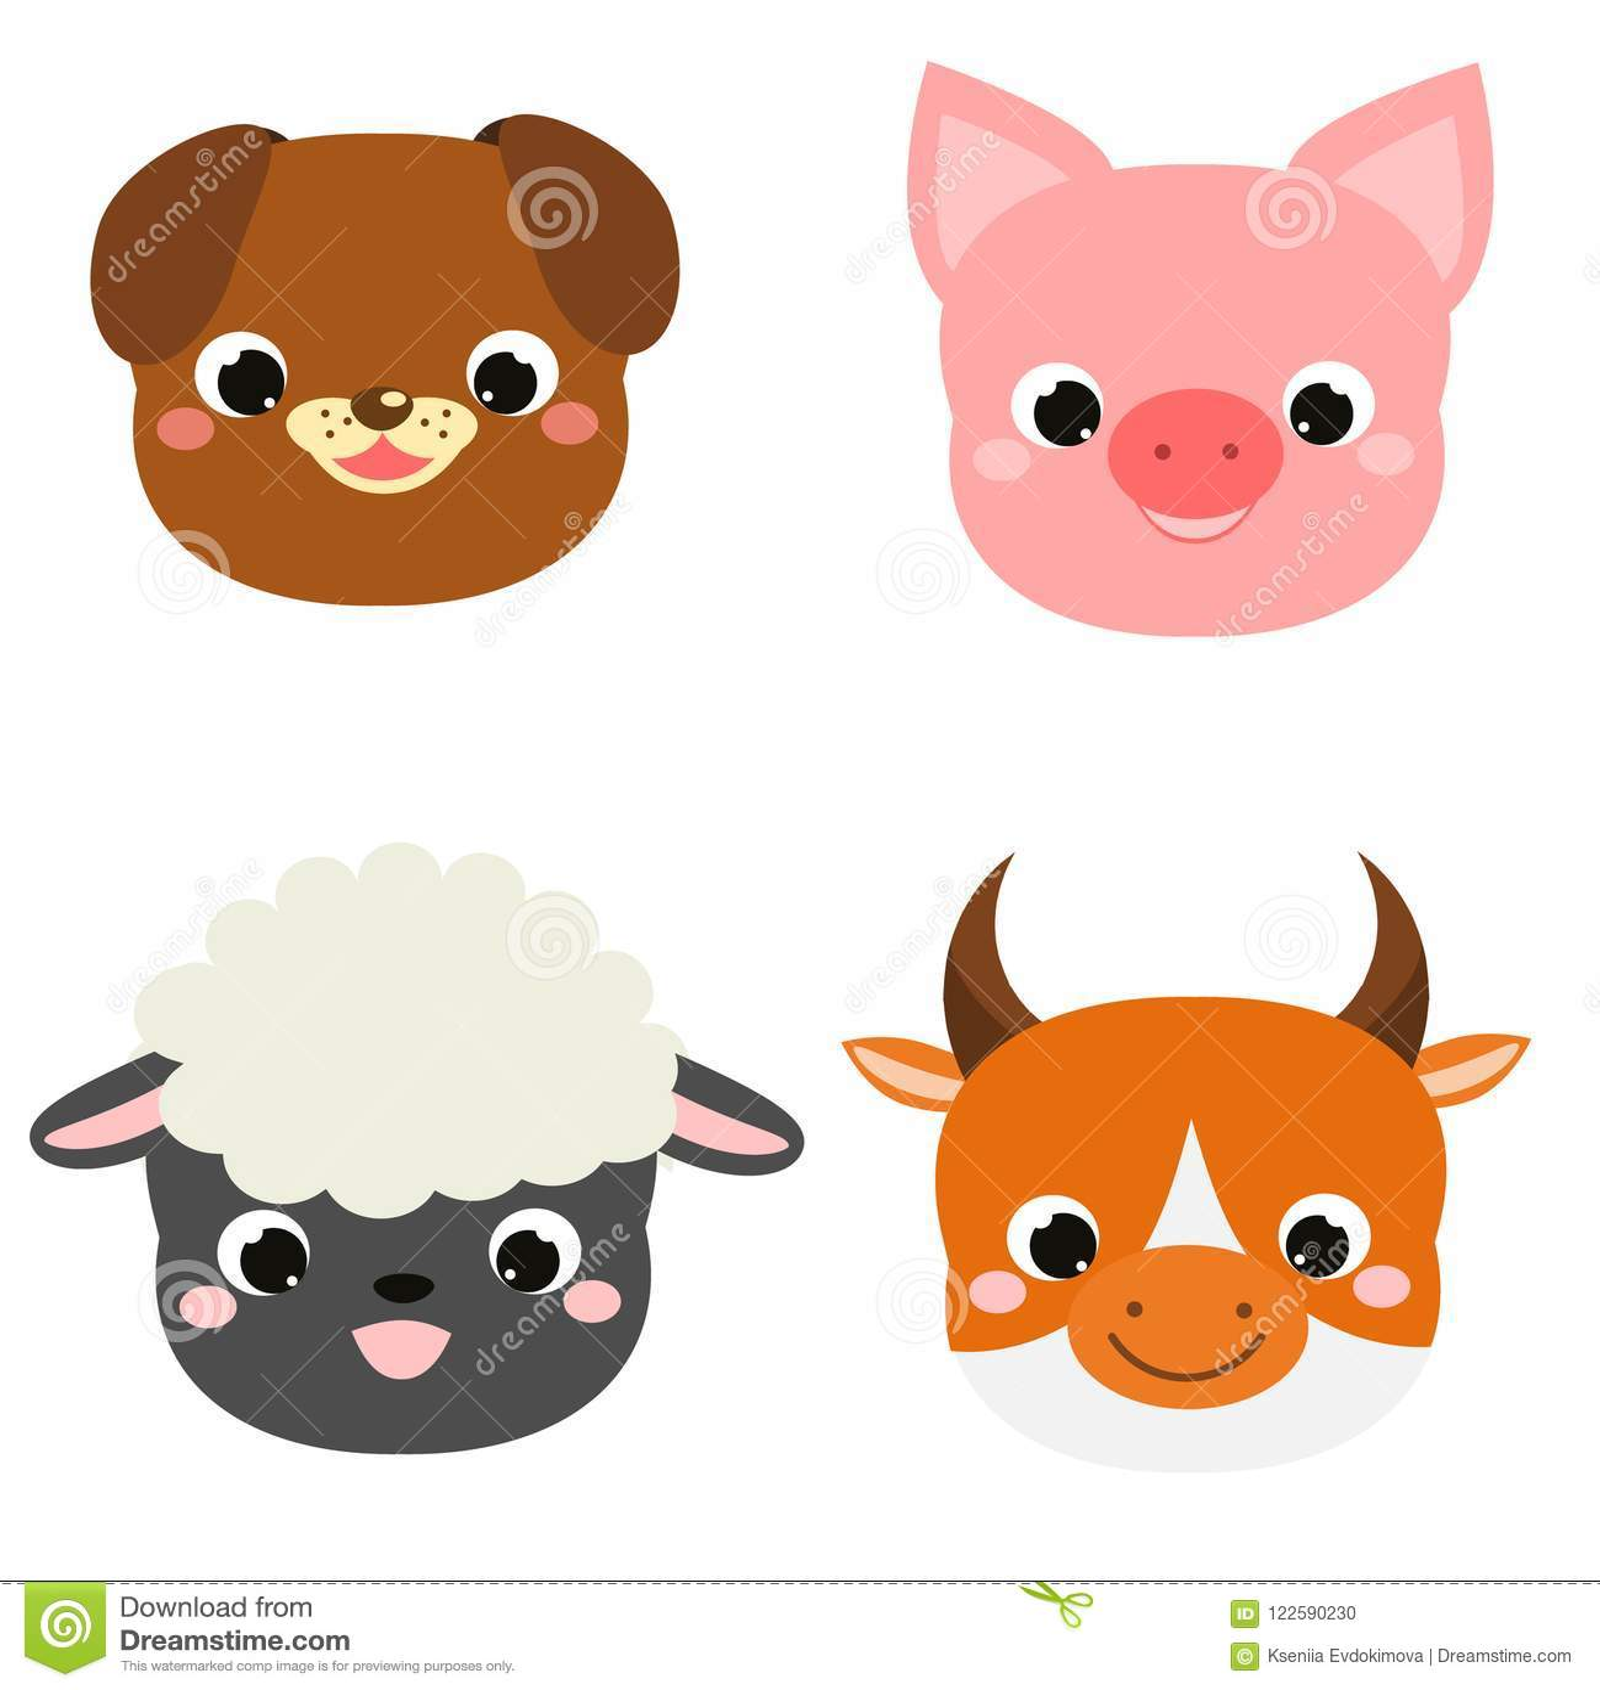 Cute animals faces. Cartoon kawaii farm pets icons